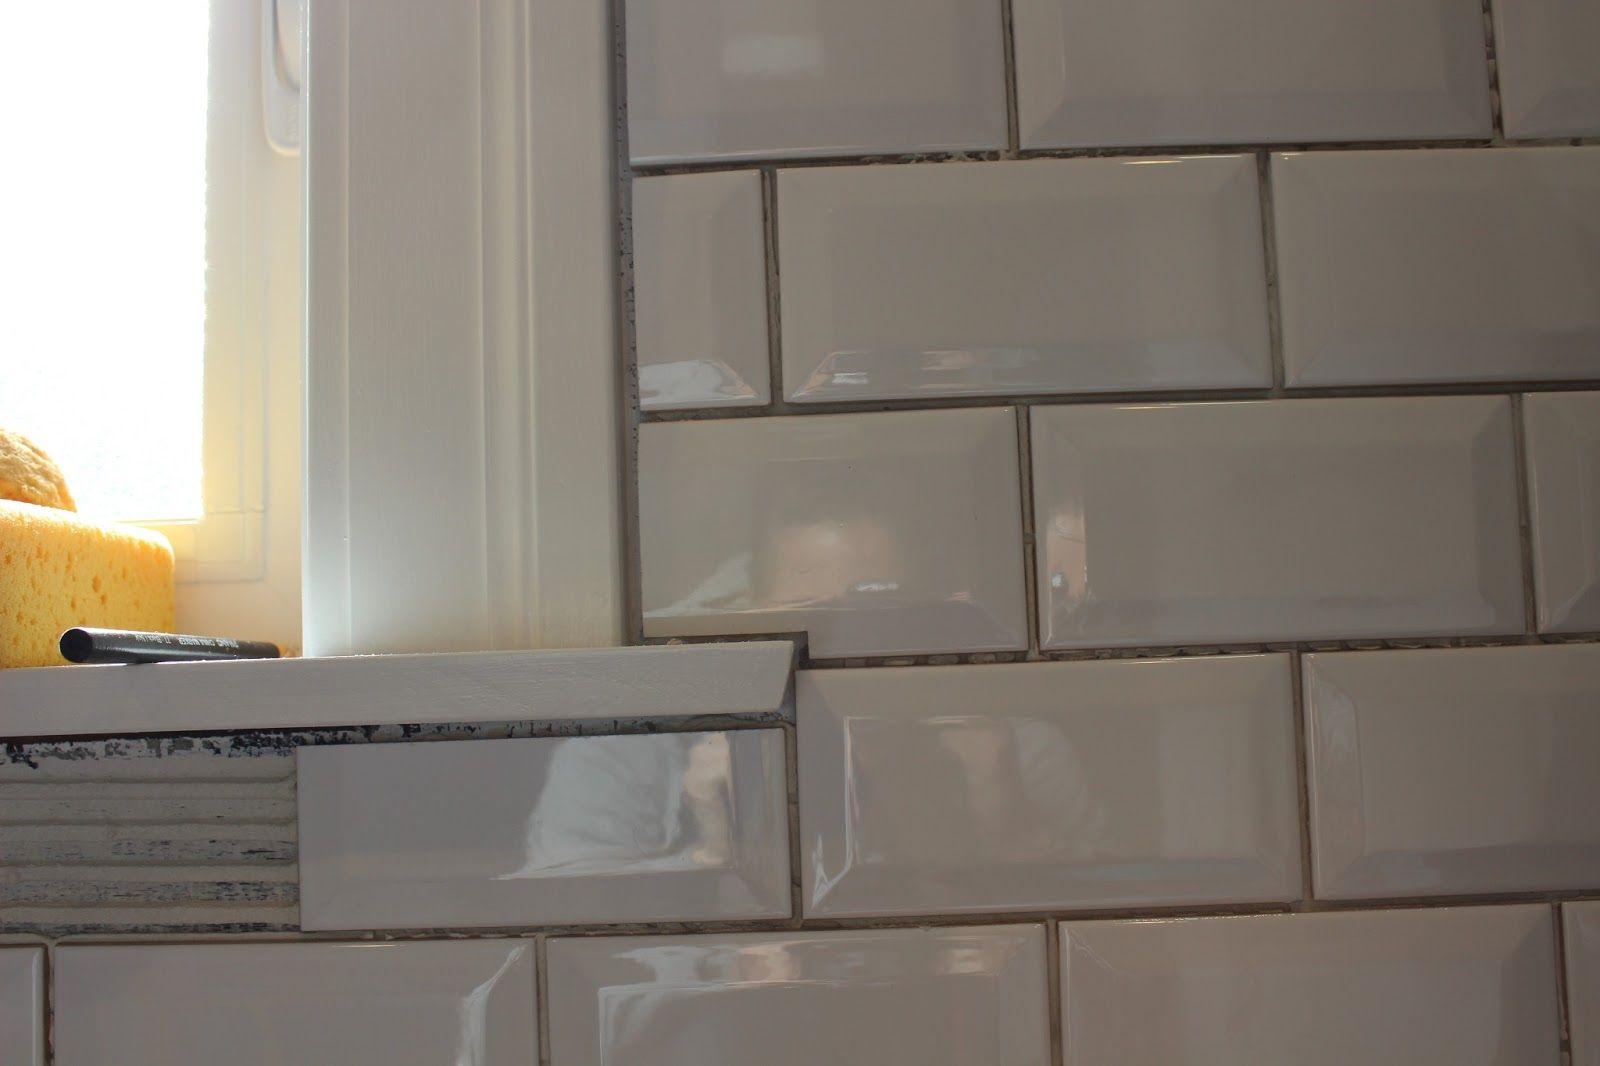 Img 0594 Jpg 1 600 1 066 Pixels Wood Window Sill Tiles Tile